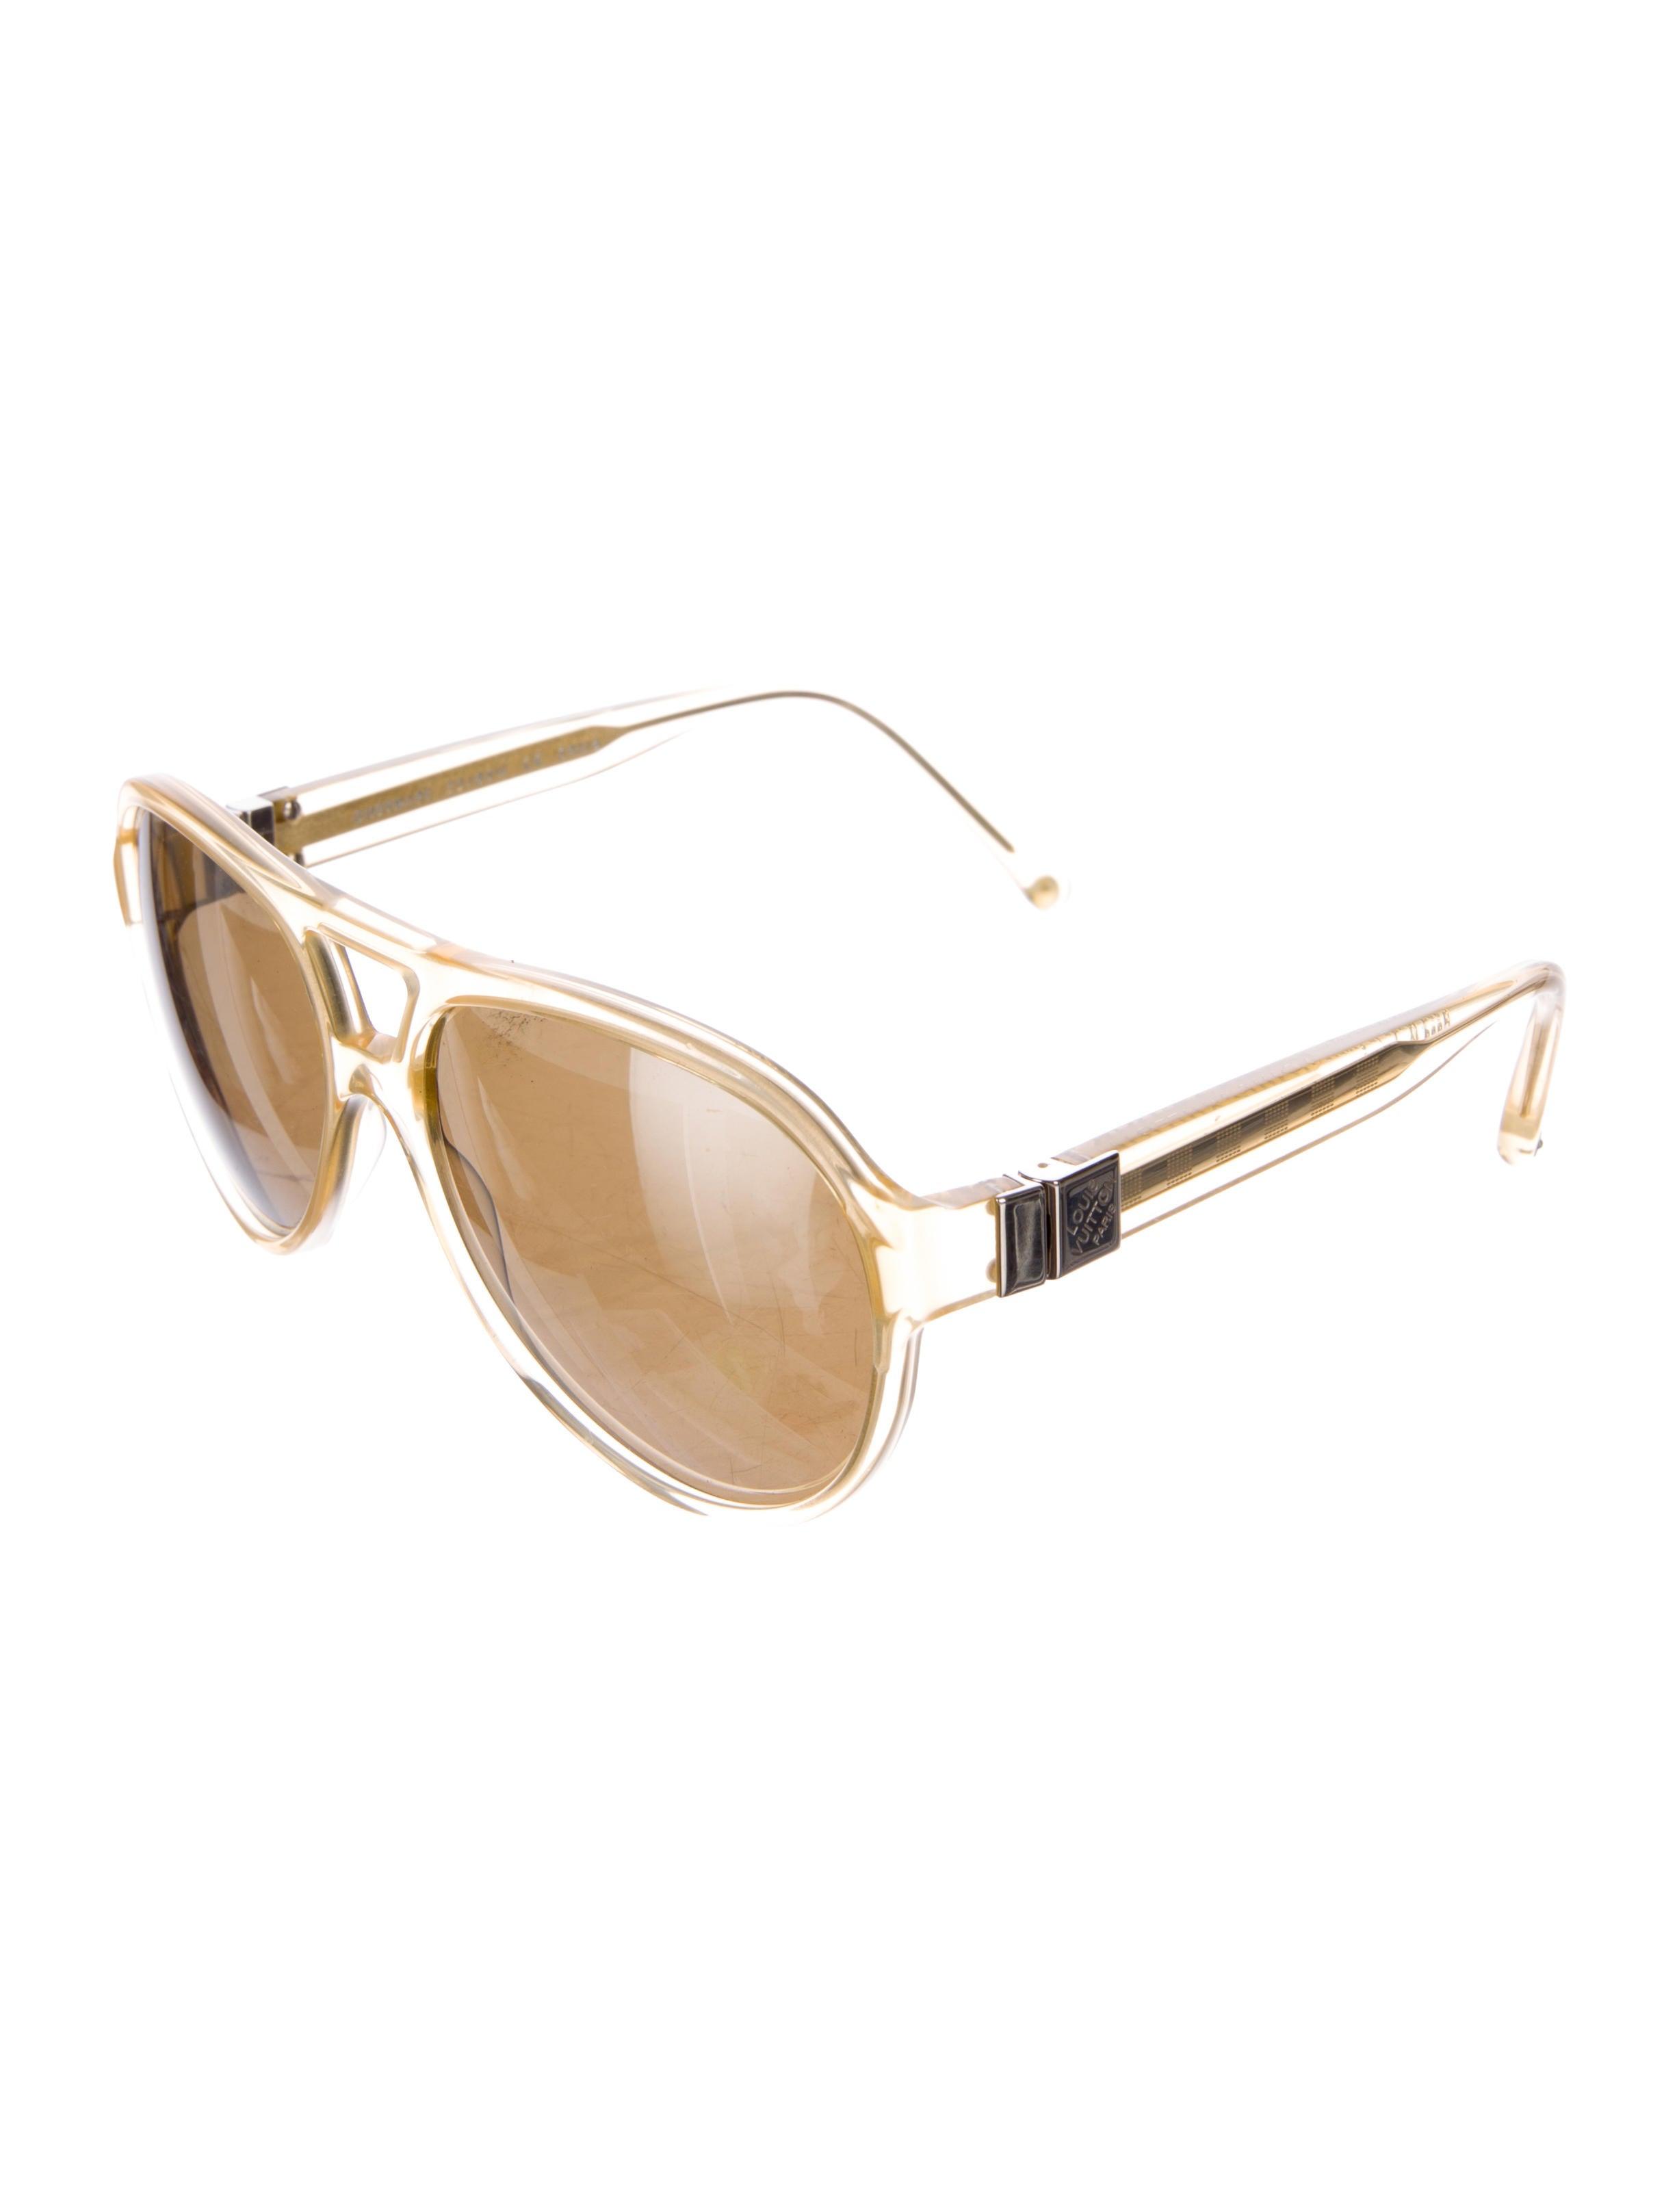 cc48e568a3 Louis Vuitton Vintage Aviator Sunglasses Price